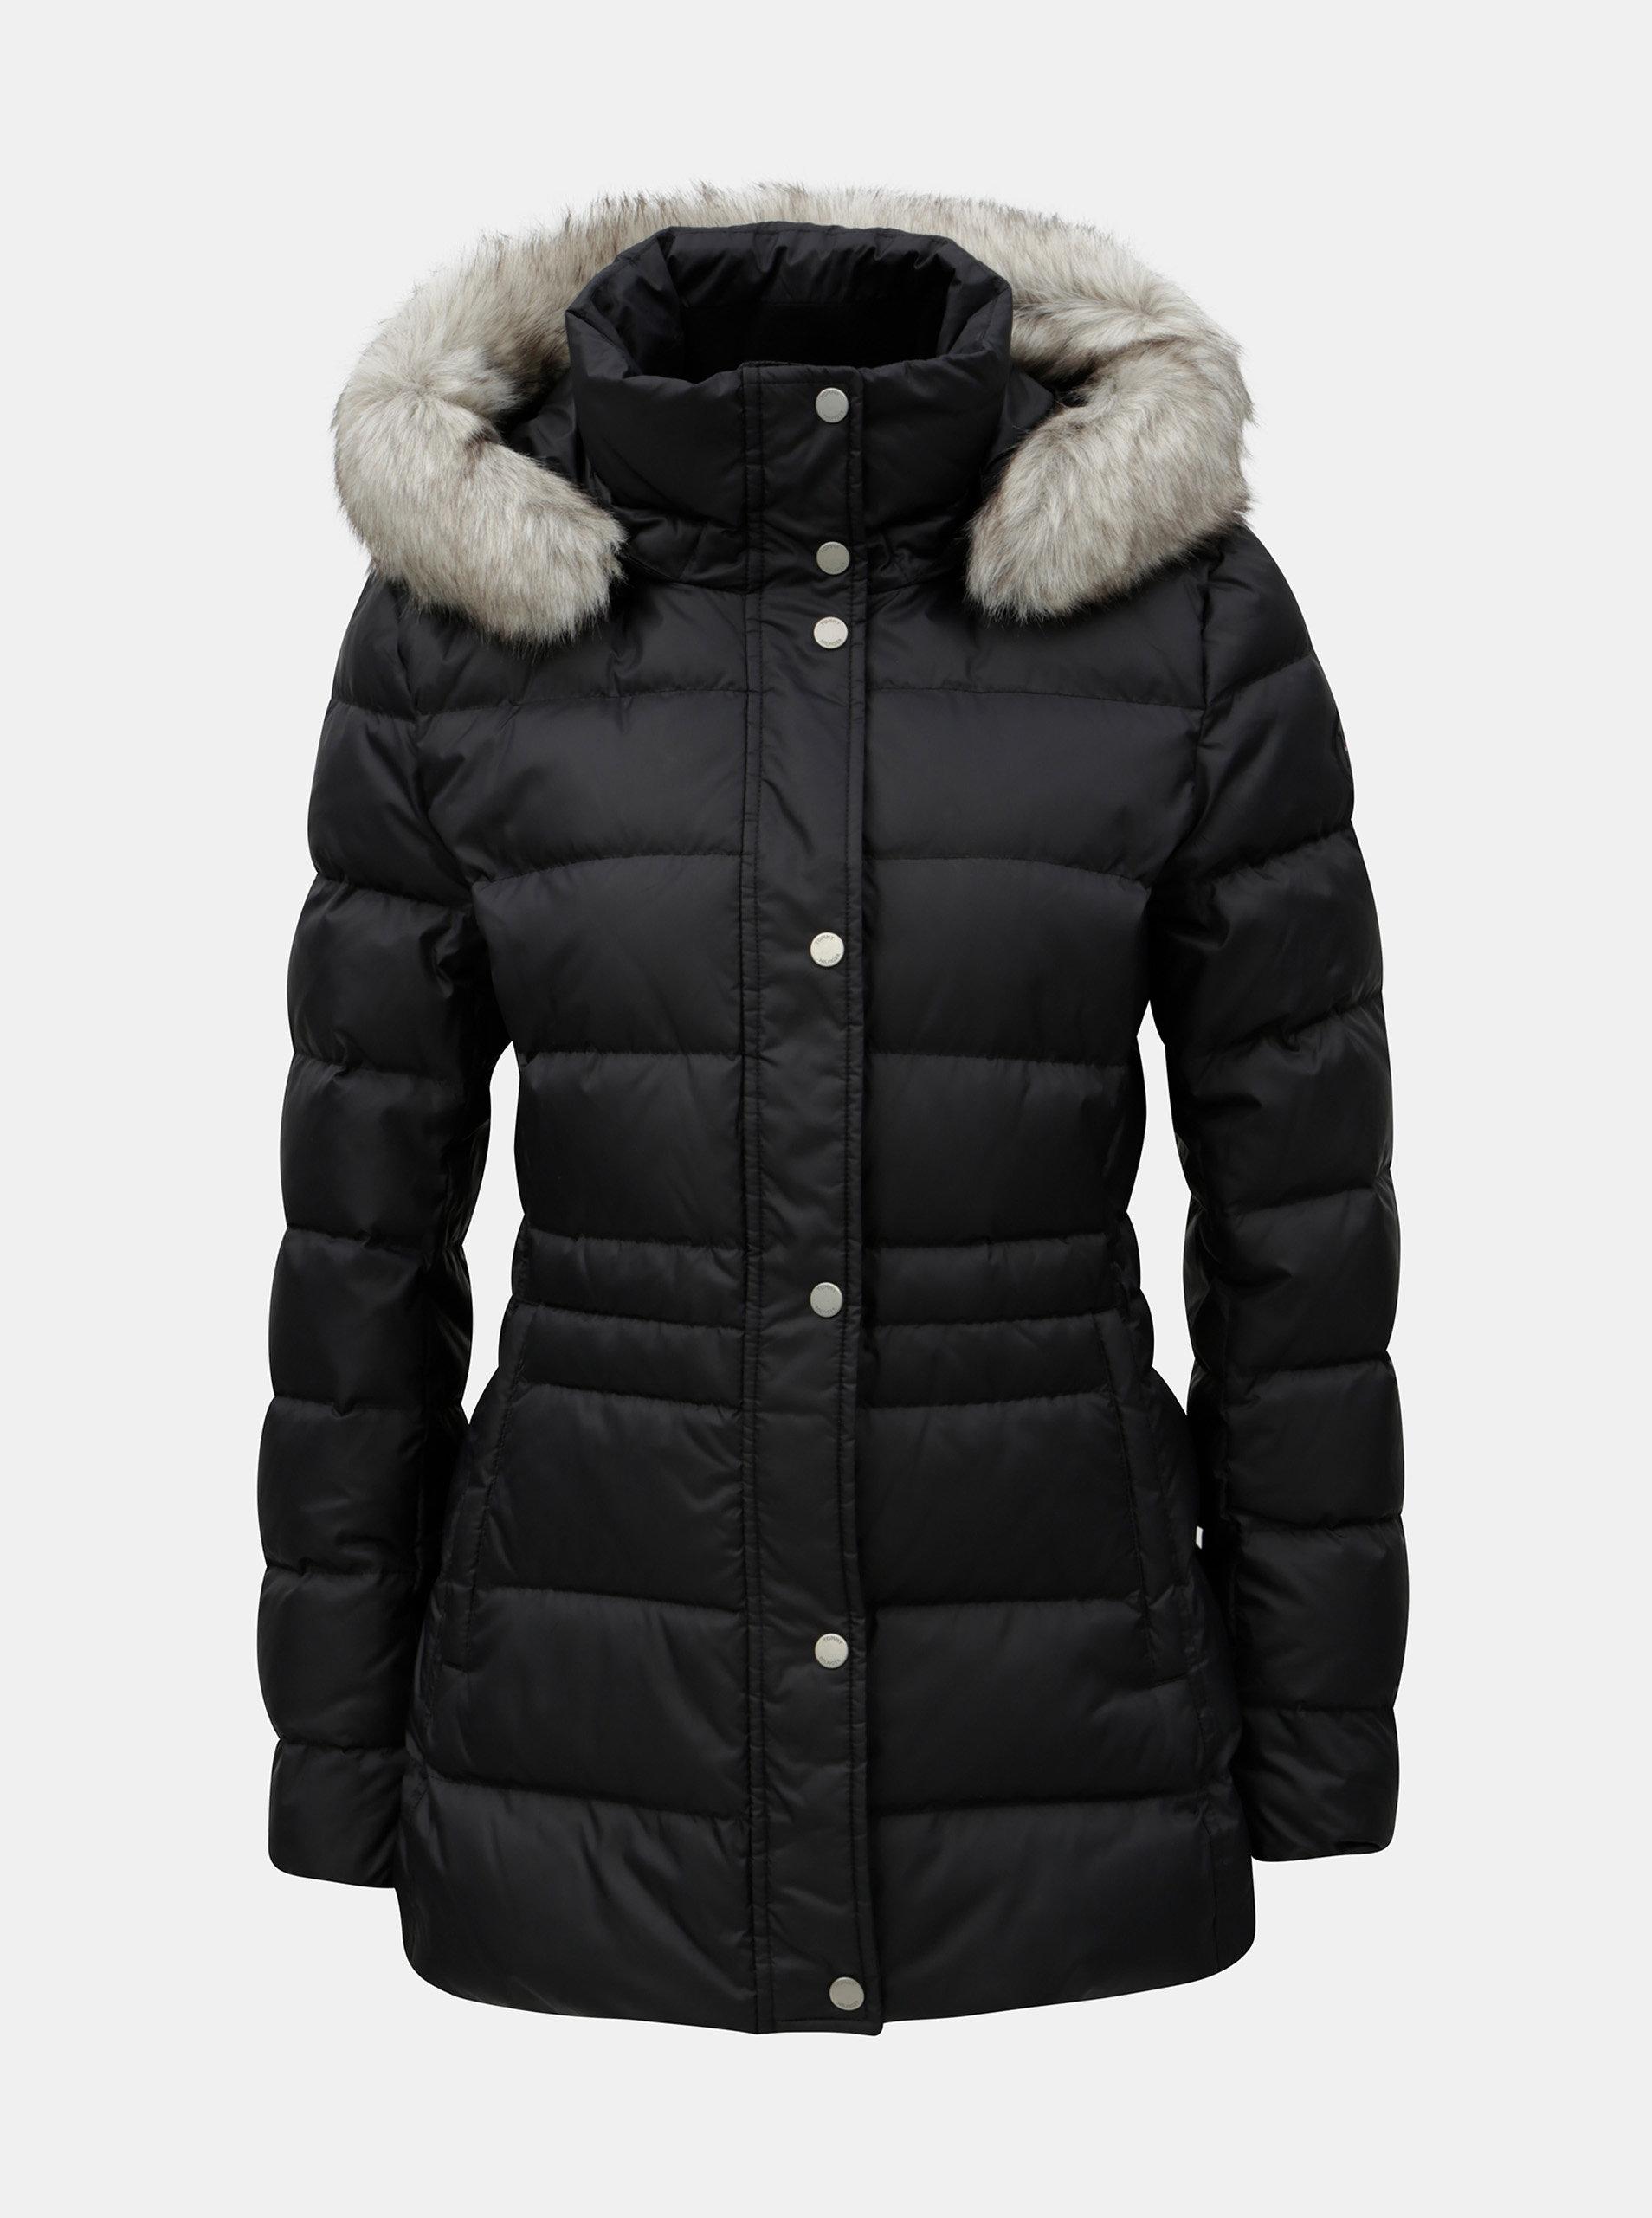 Čierna dámska páperová prešívaná zimná bunda Tommy Hilfiger ... 377cc13b157